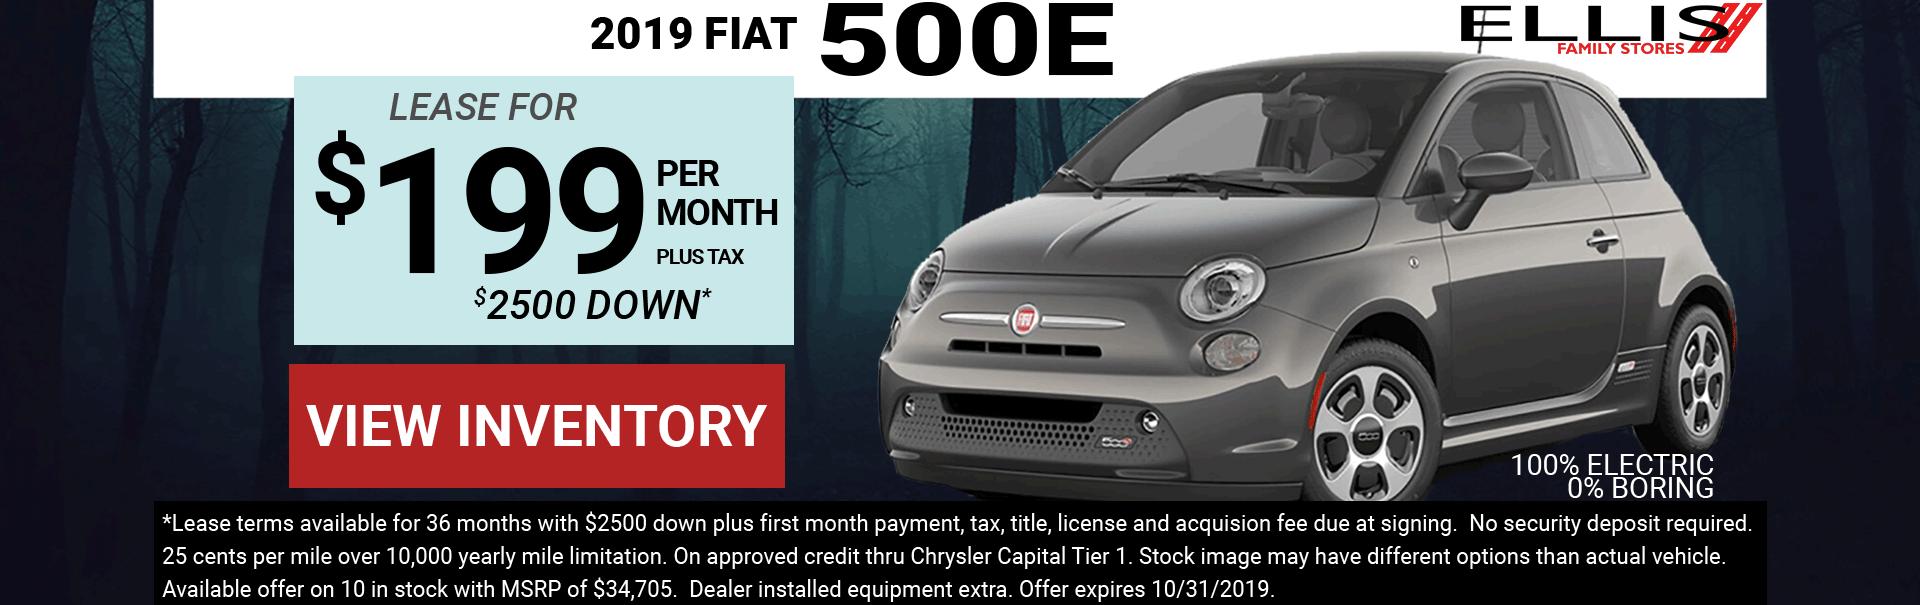 Fiat 500e Lease Special